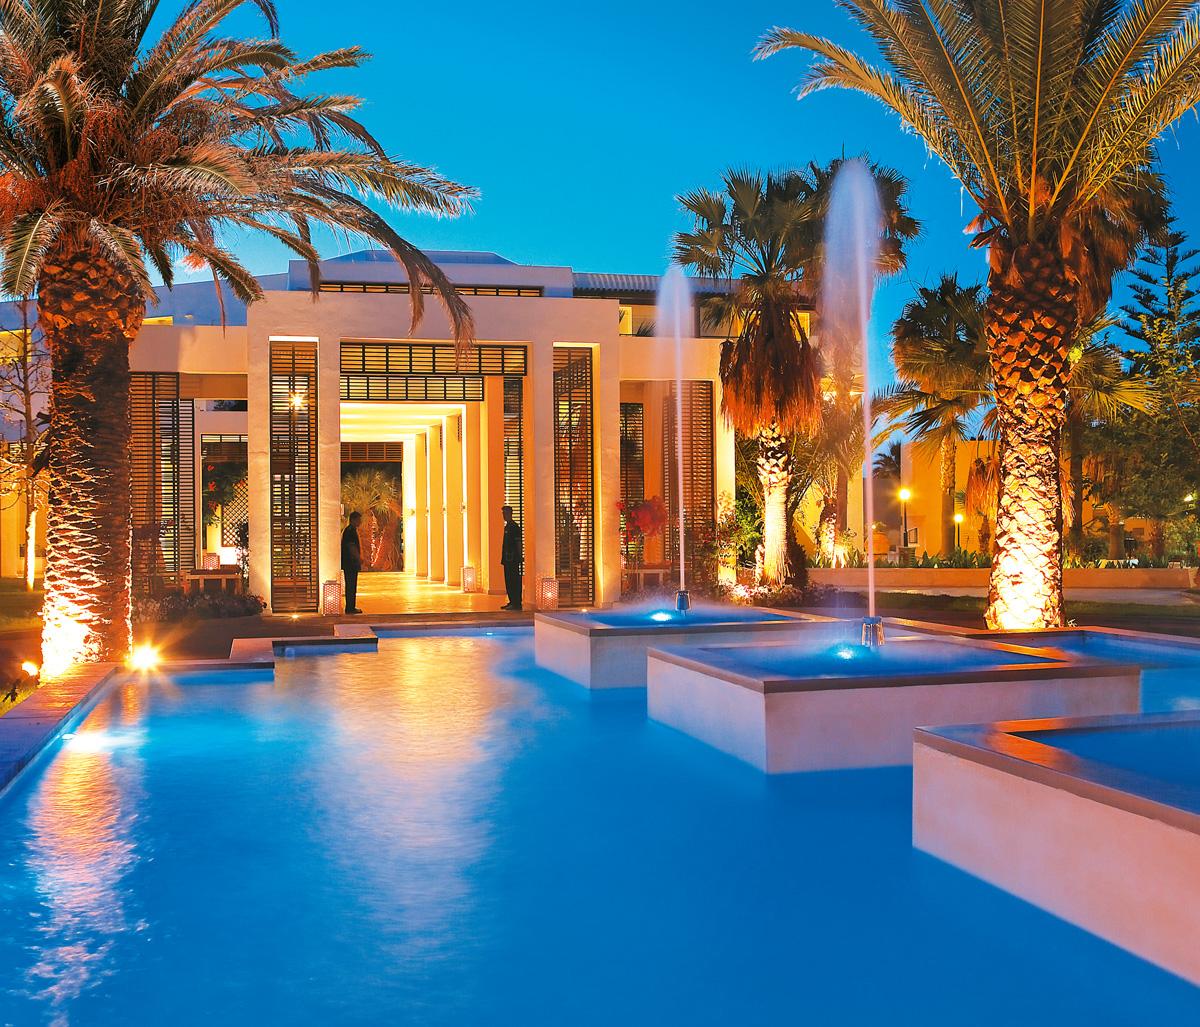 Luxury Hotel In Crete Video Creta Palace Rethymno